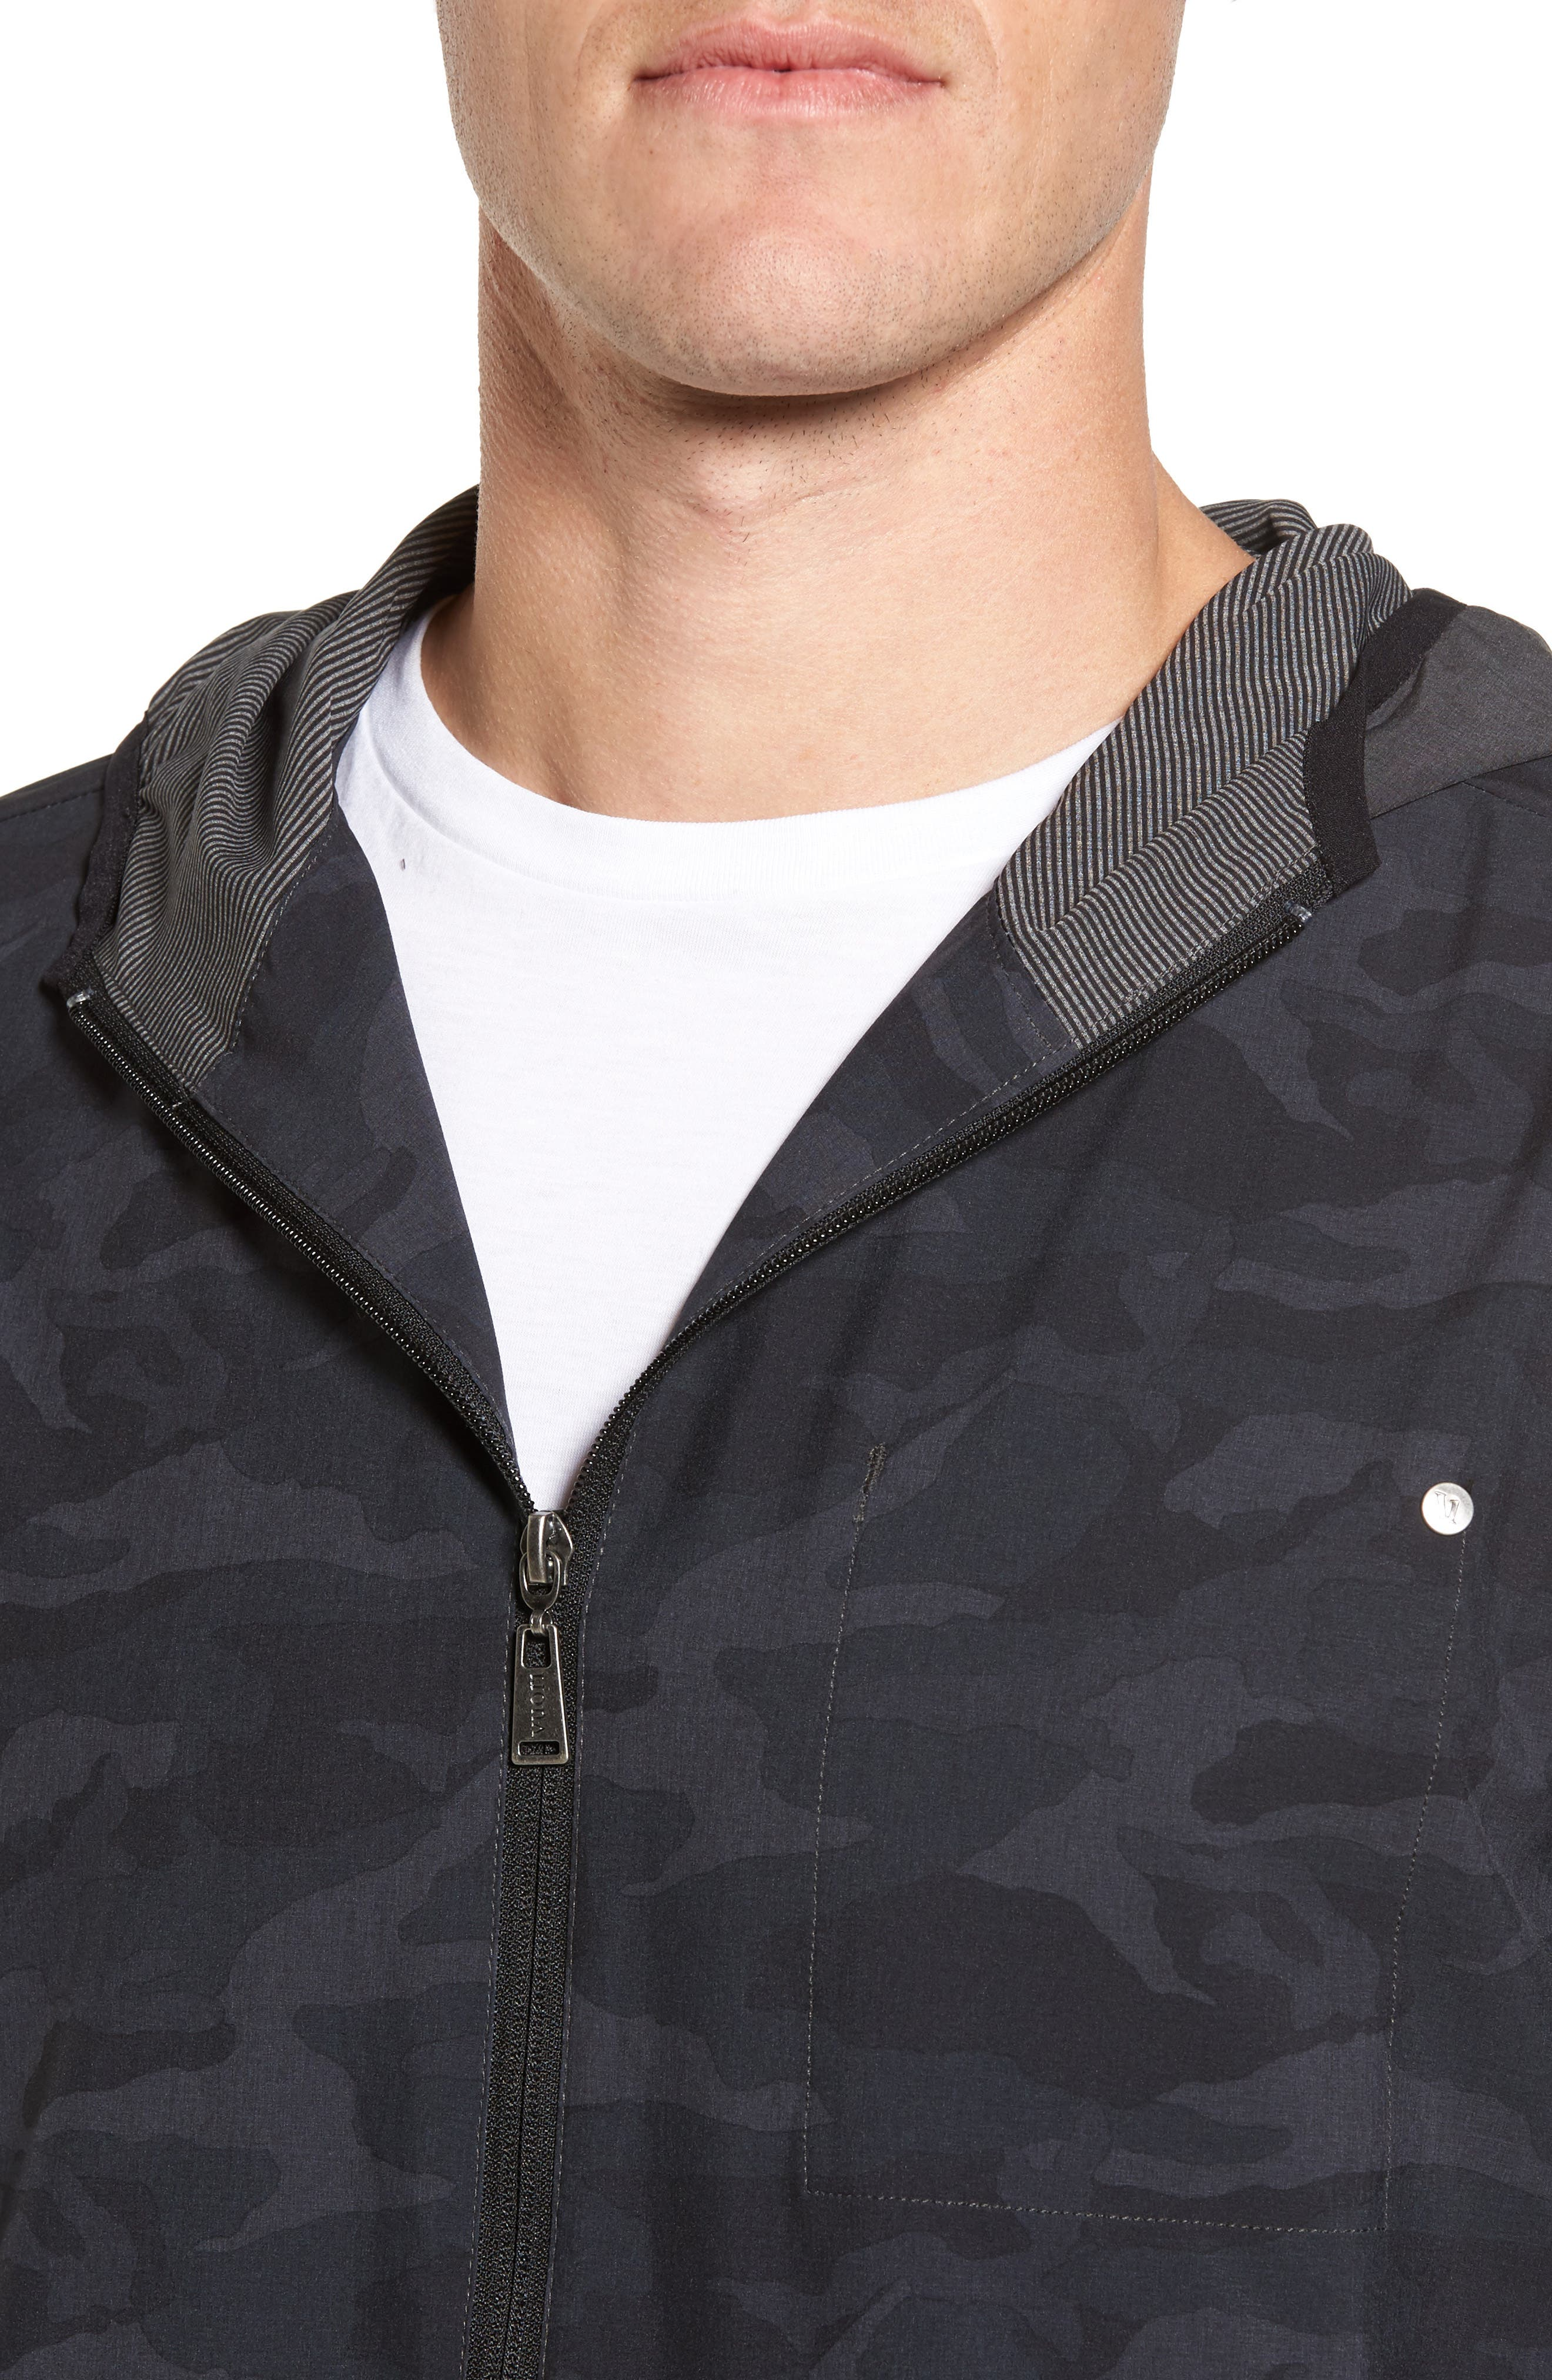 Outdoor Training Shell Jacket,                             Alternate thumbnail 4, color,                             021